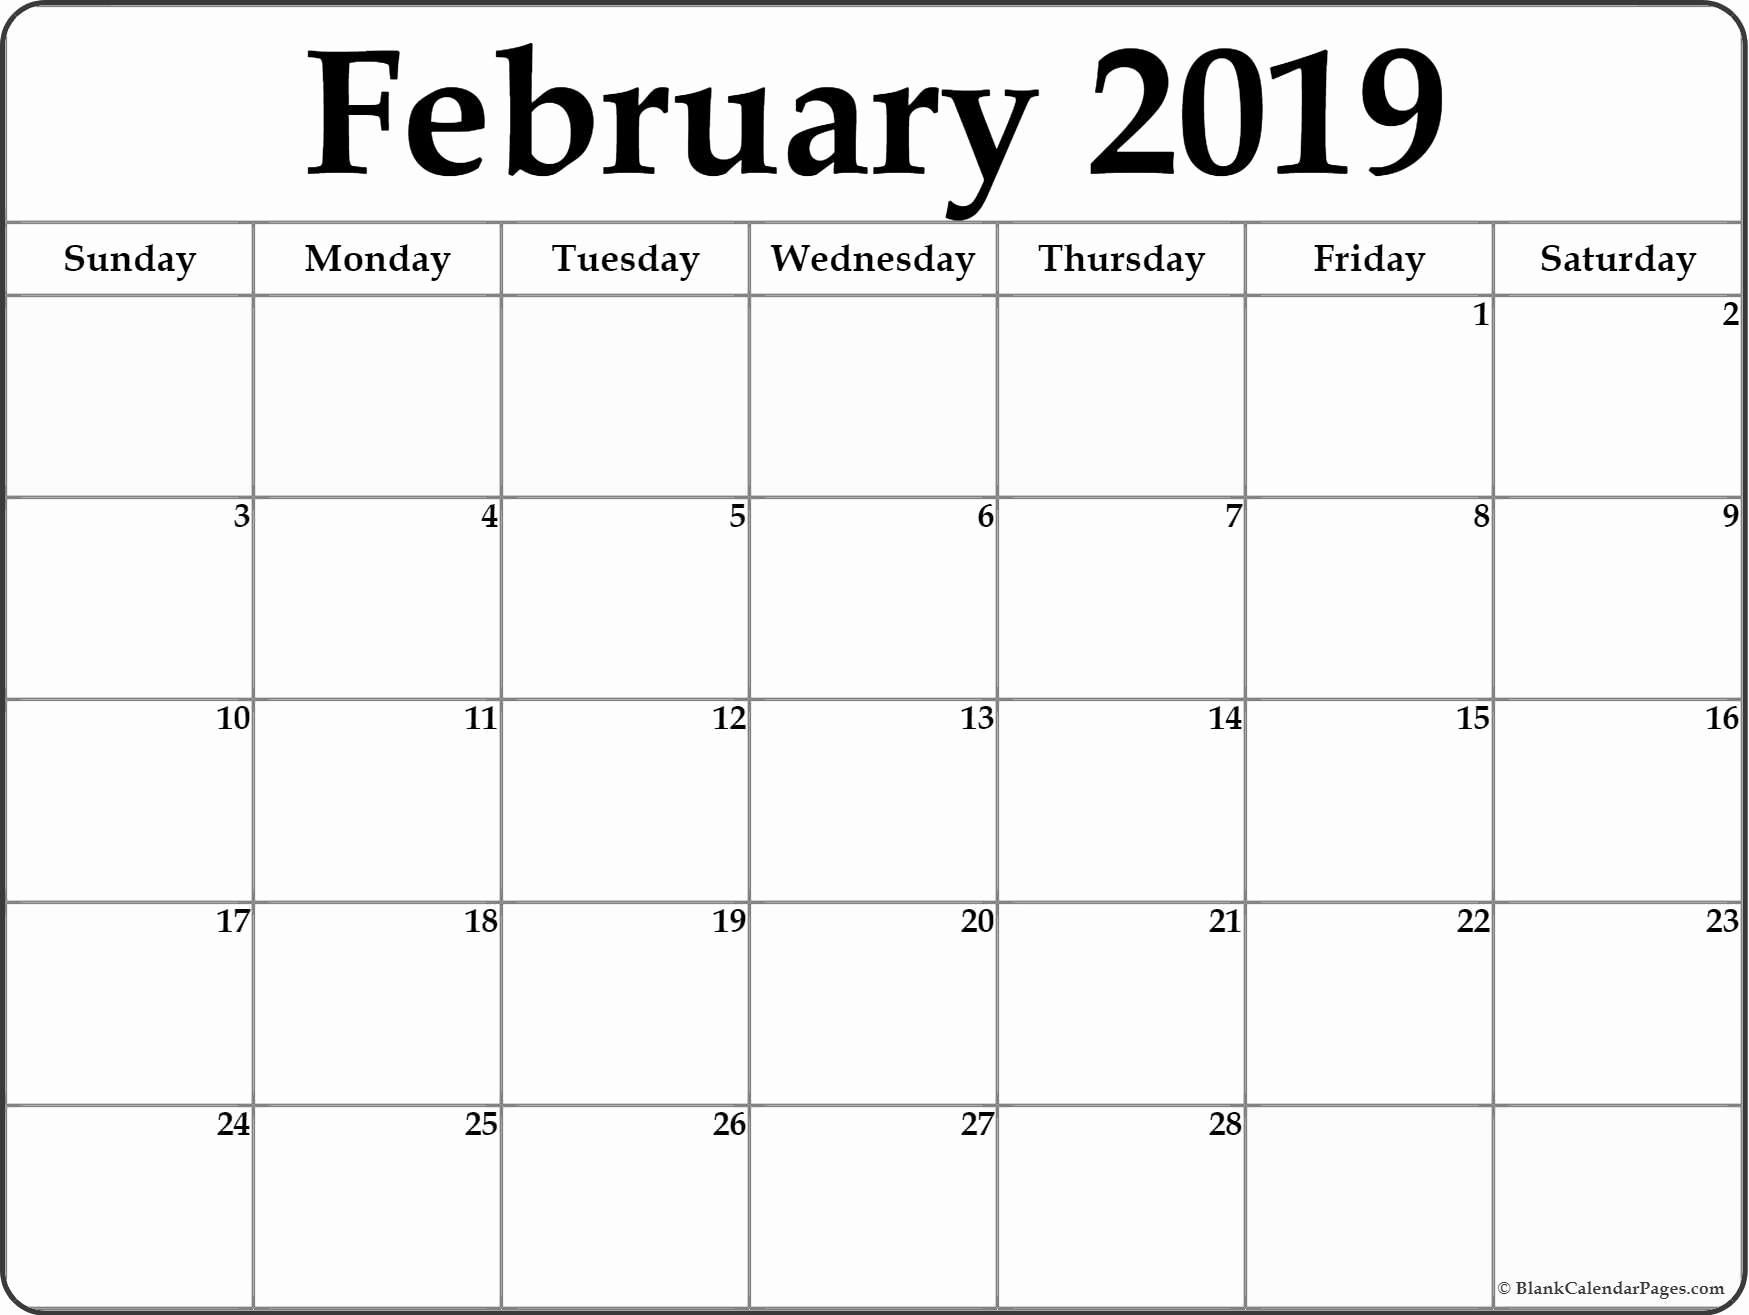 Online February 2019 Calendar PDF